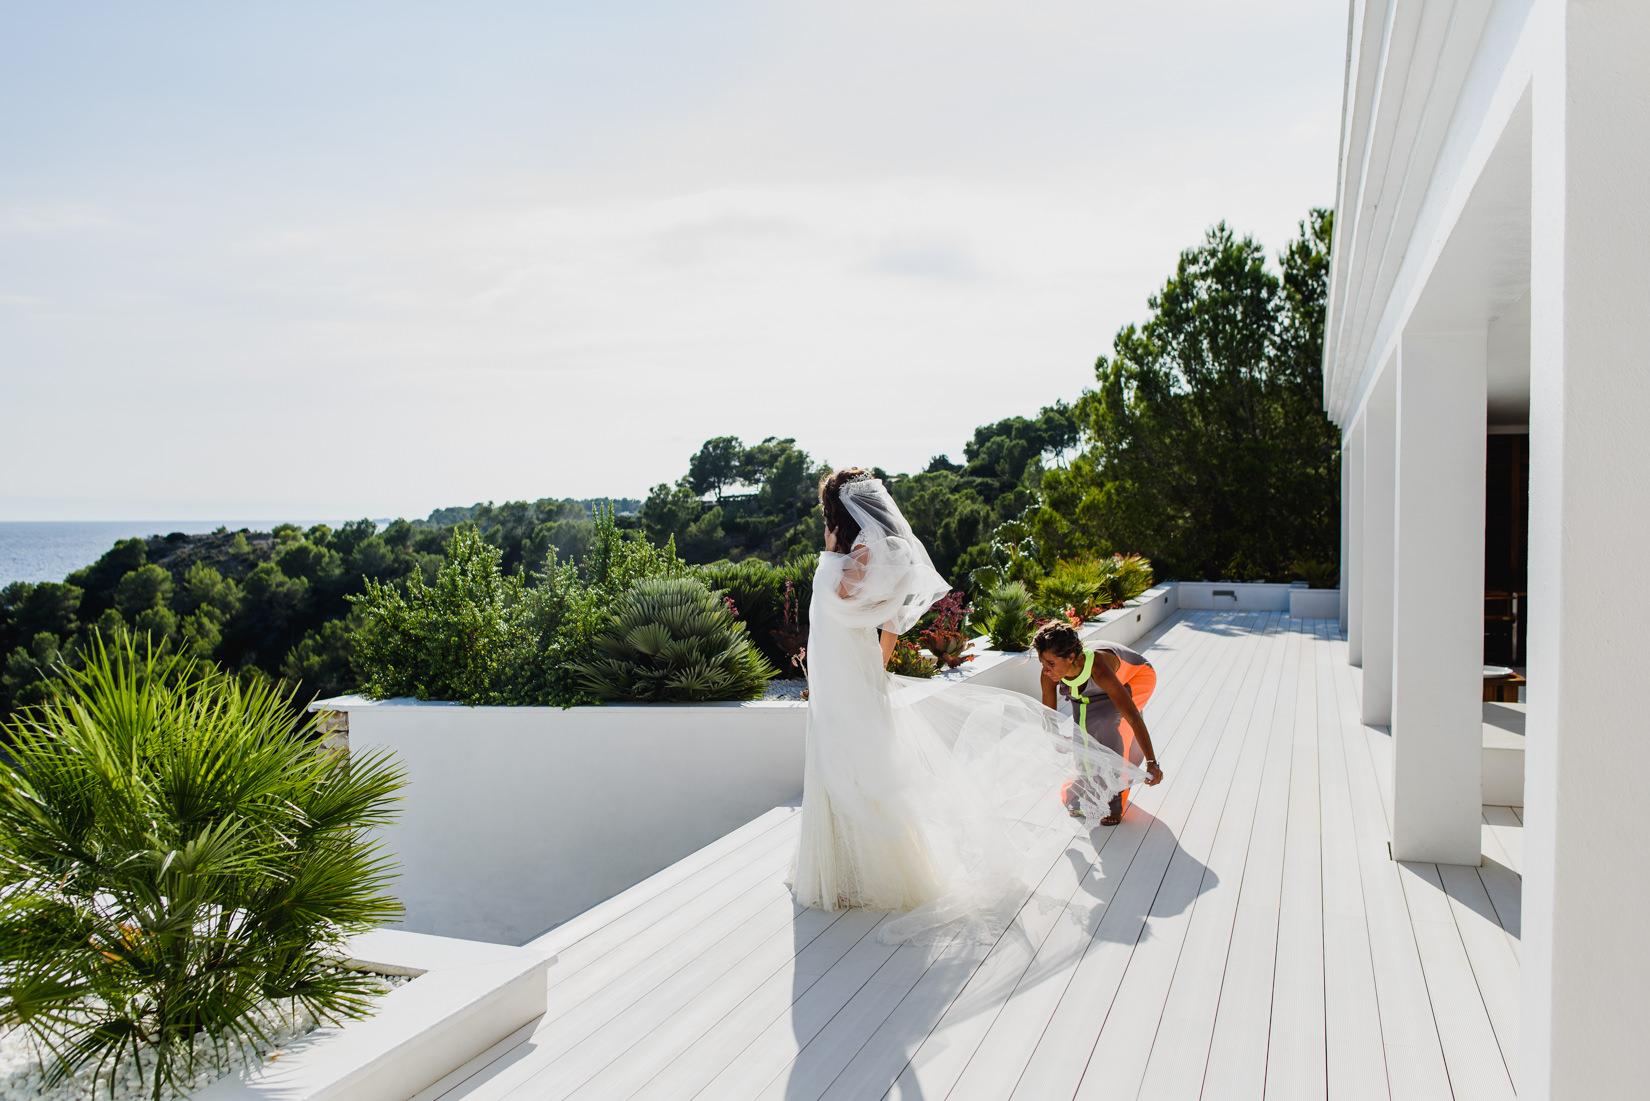 wedding-la-escollera-12.jpg